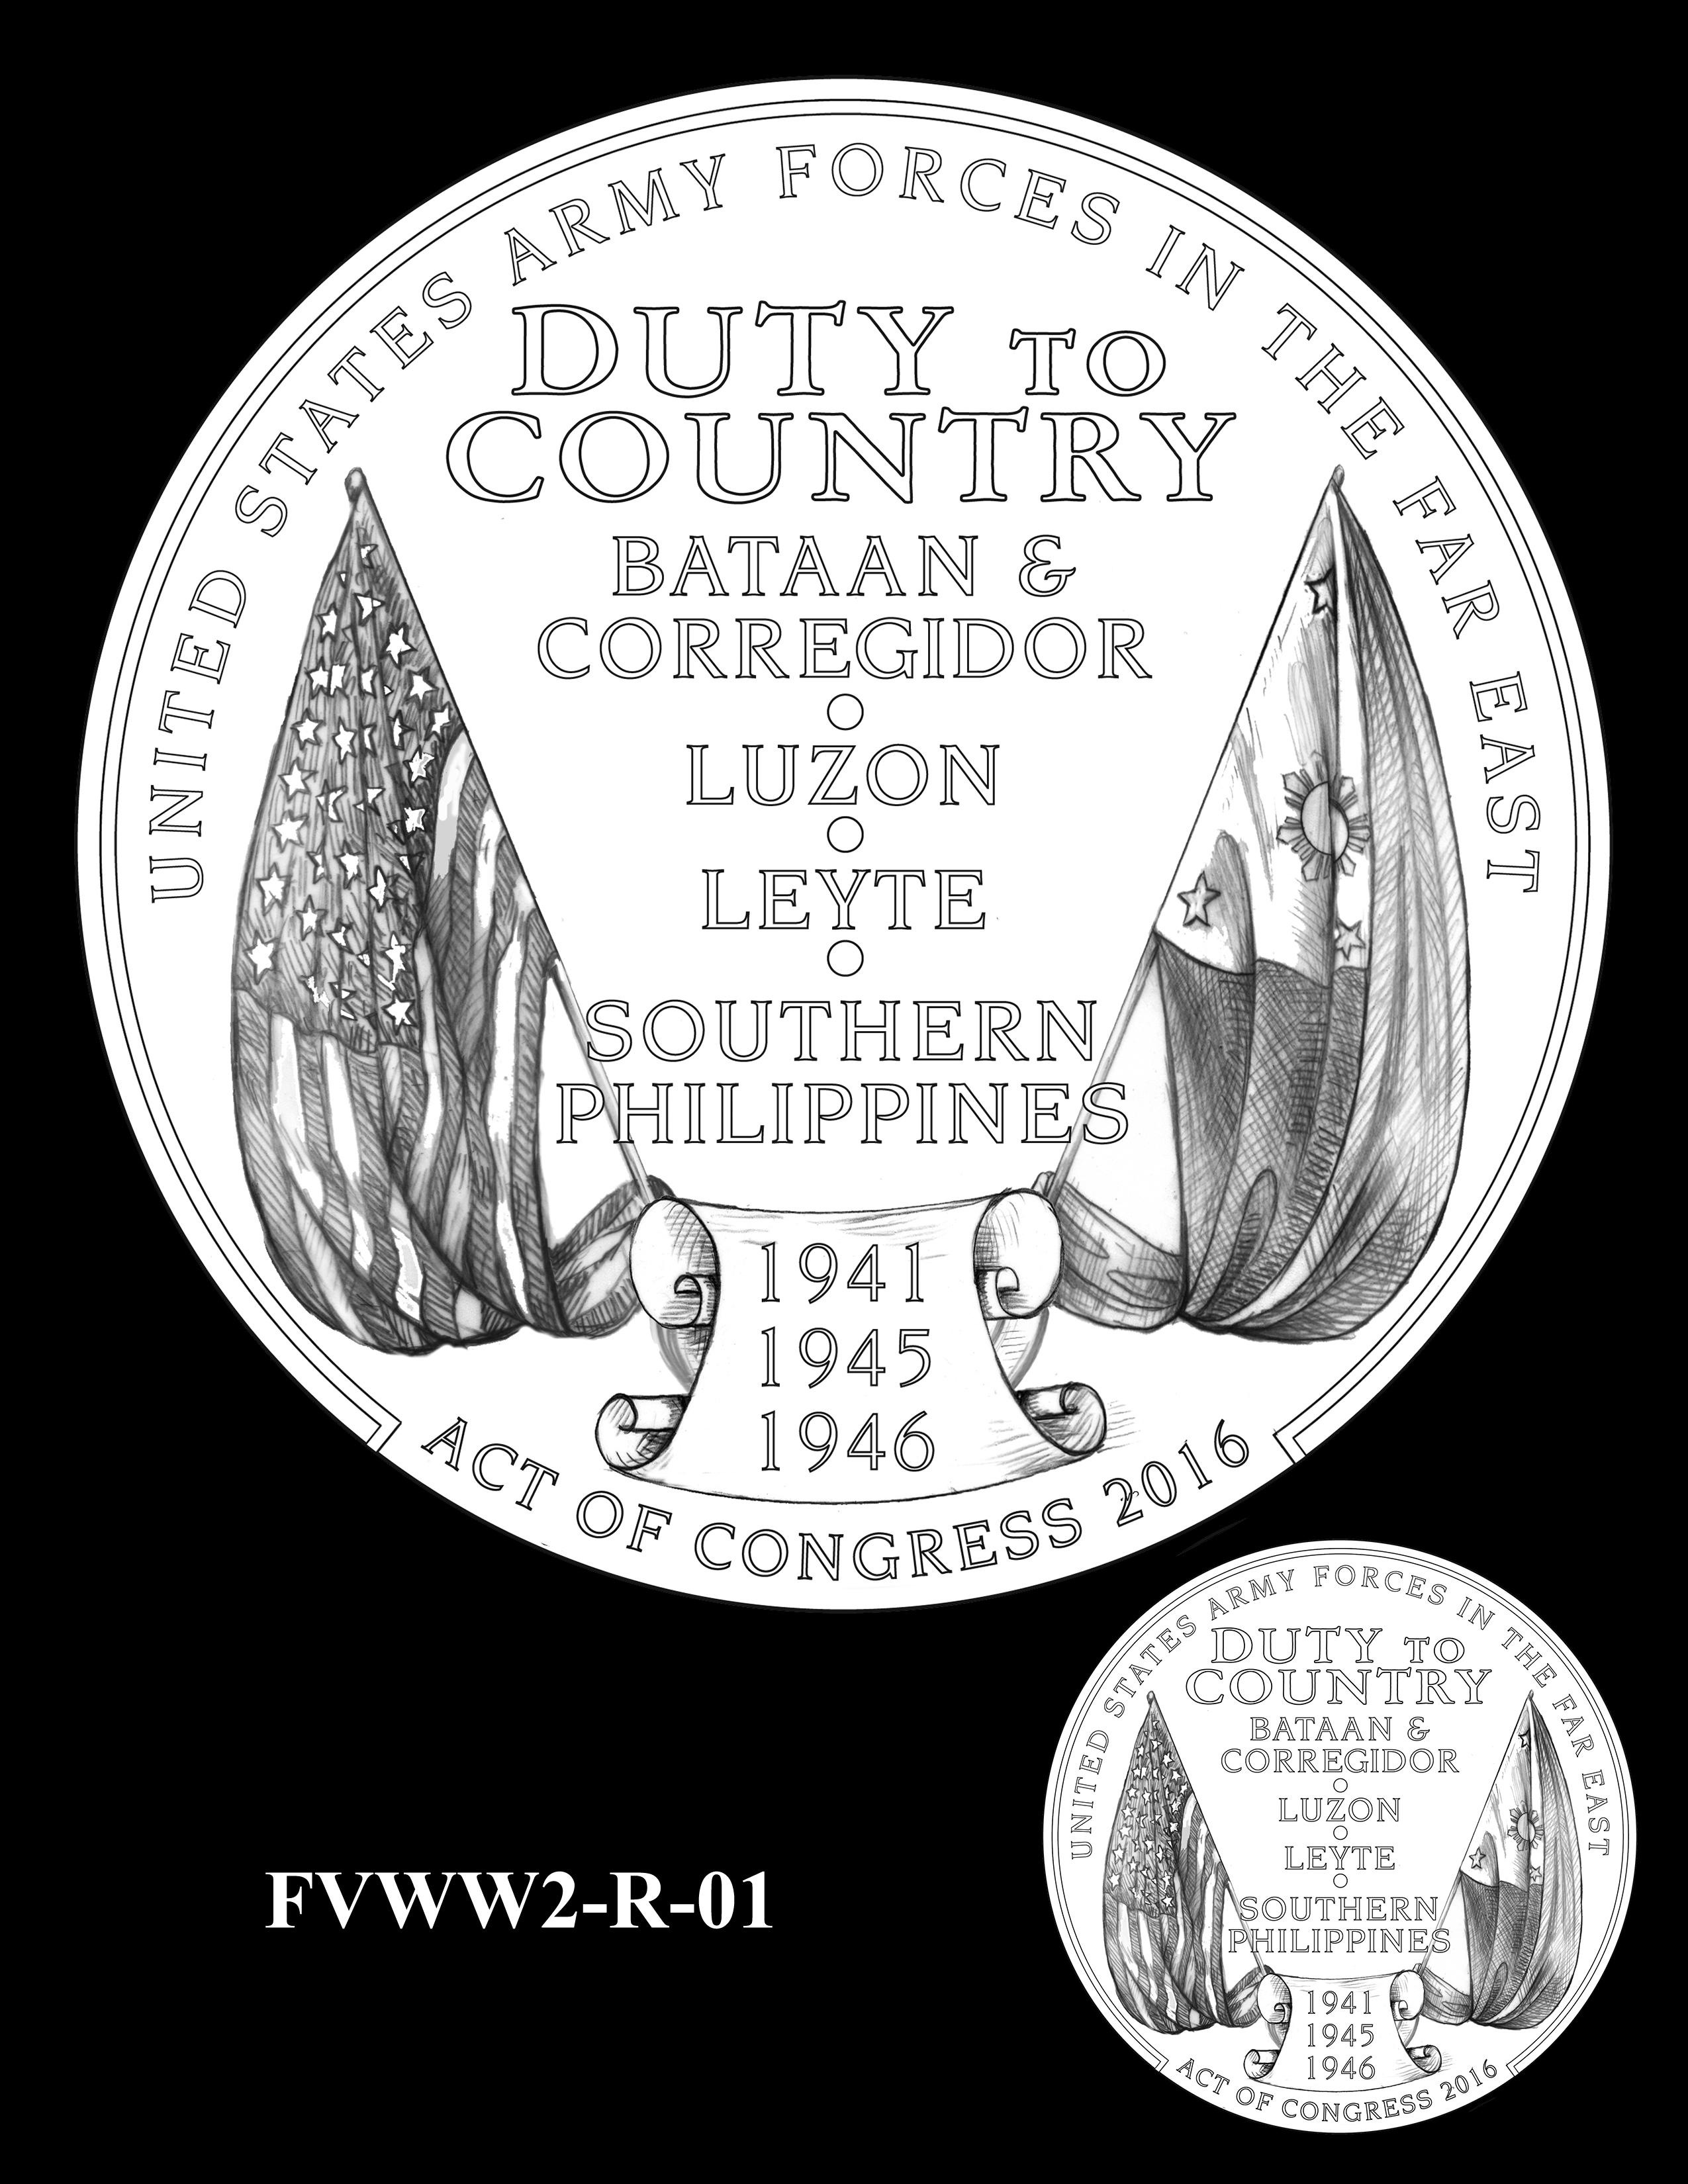 FVWW2-R-01 -- Filipino Veterans of World War II Congressional Gold Medal